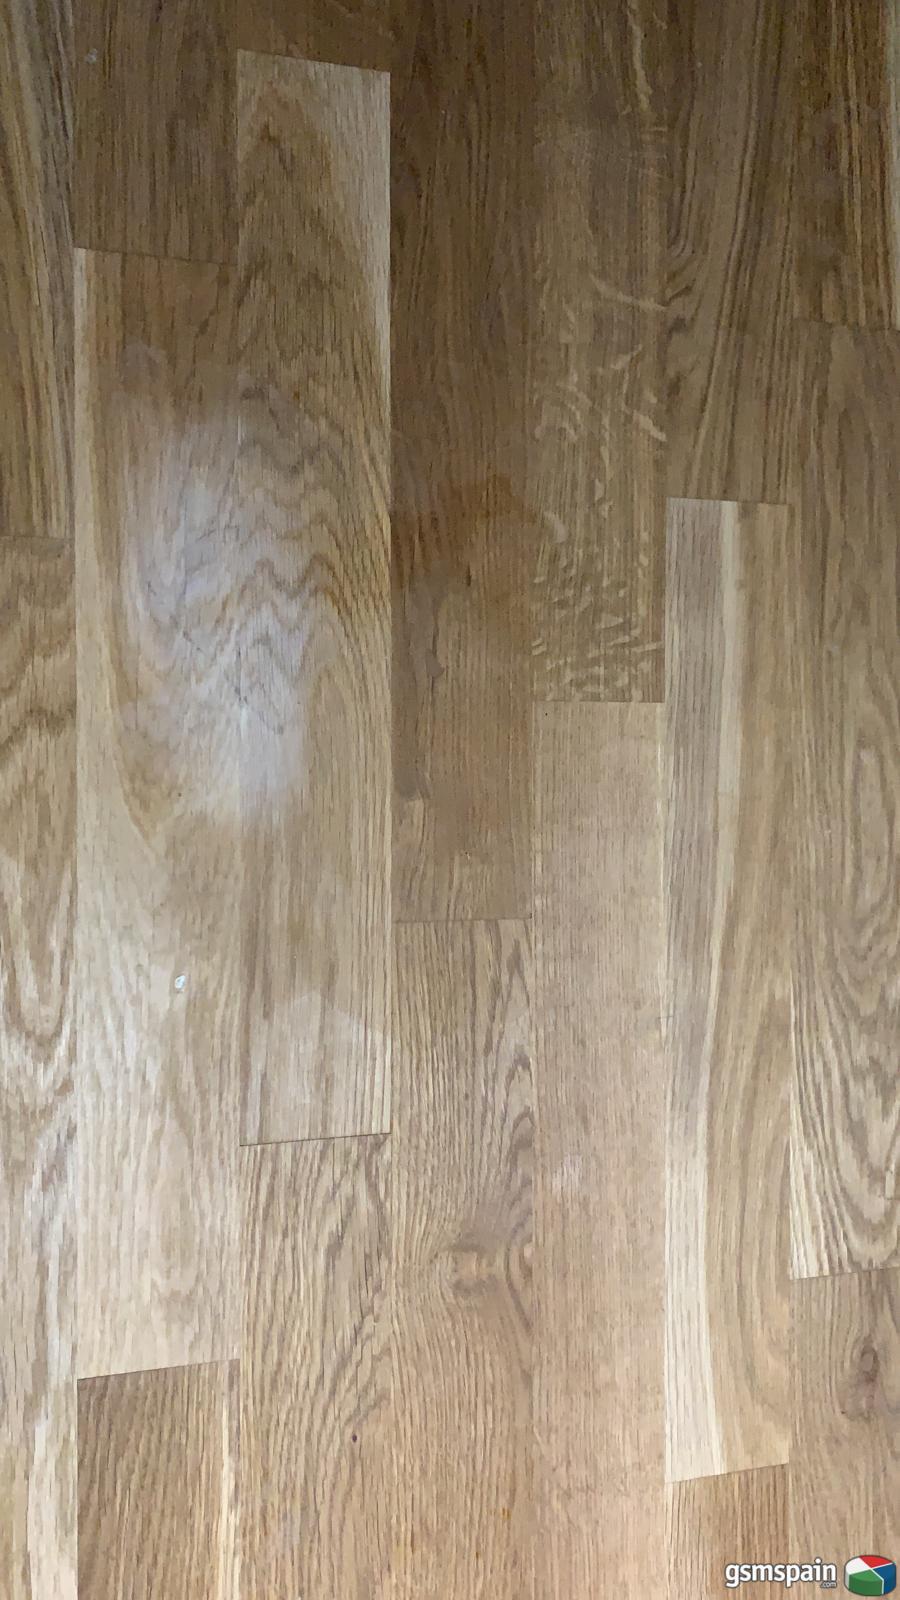 ¿ como reparar este suelo laminado?